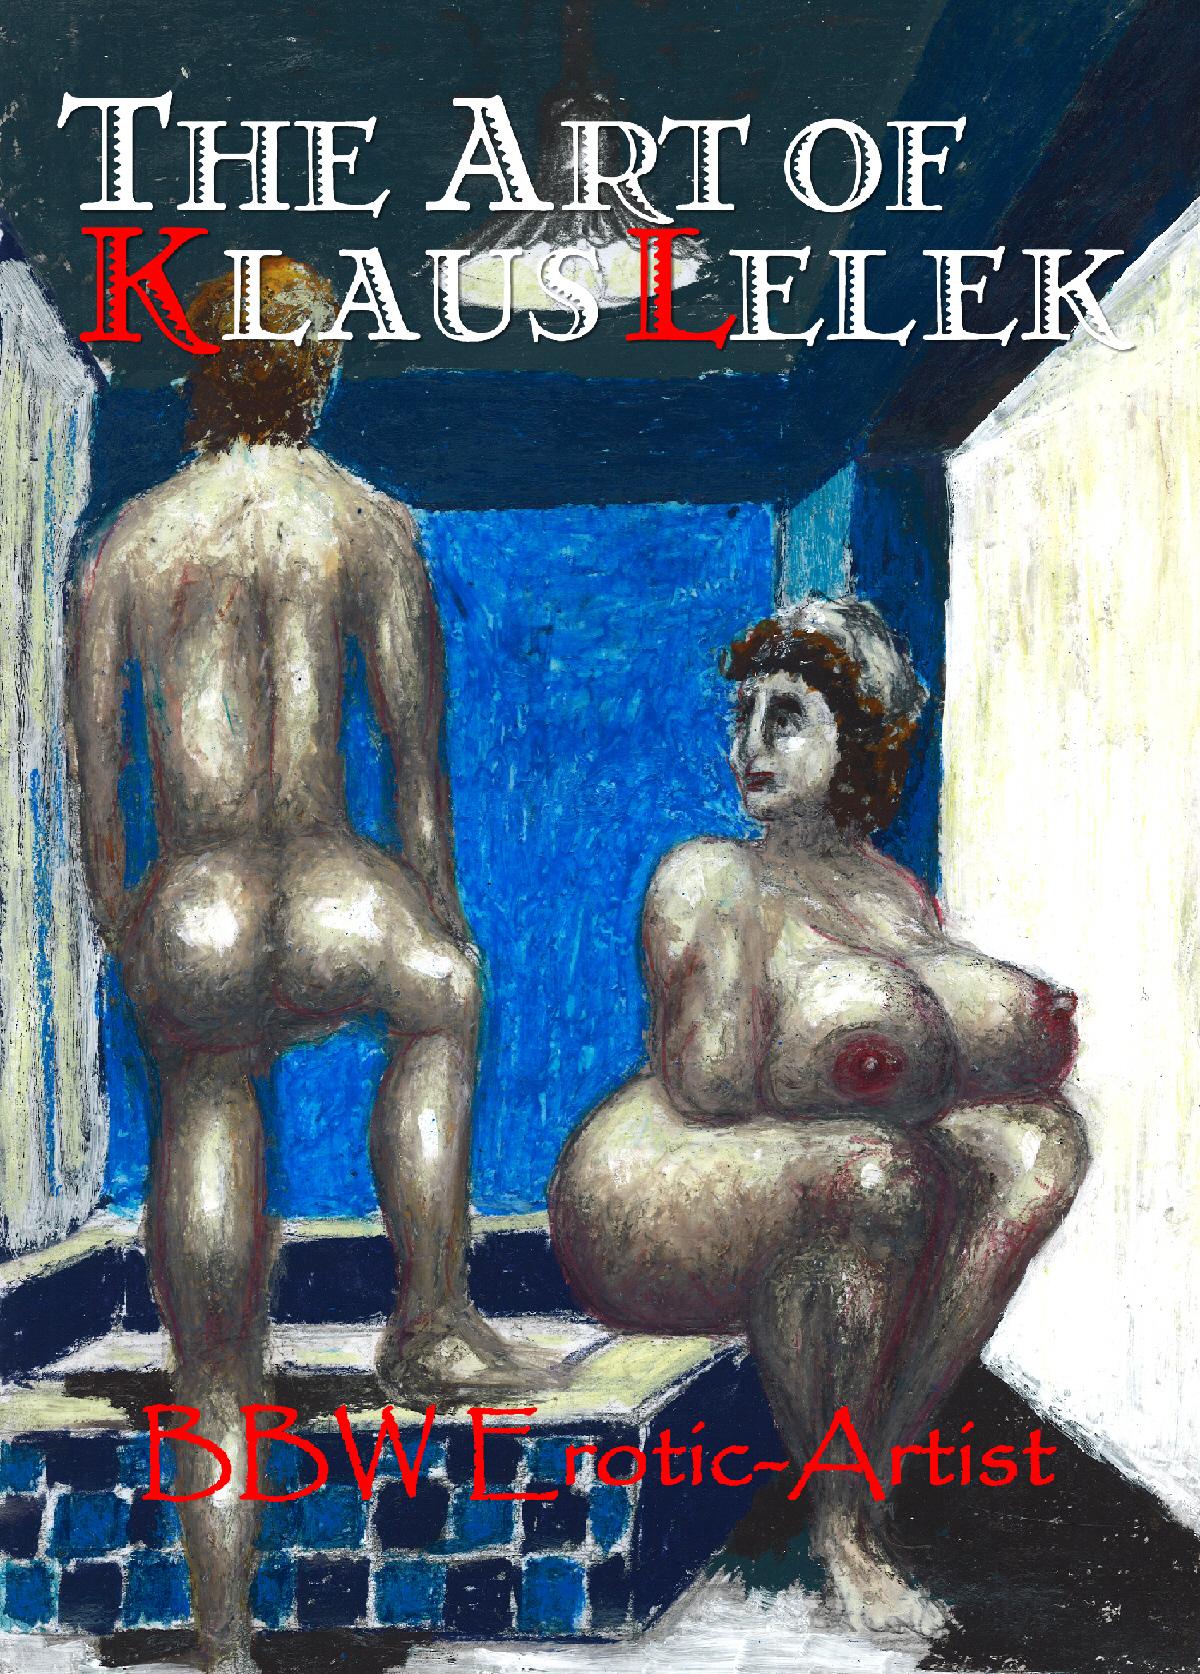 Art of Klaus Lelek